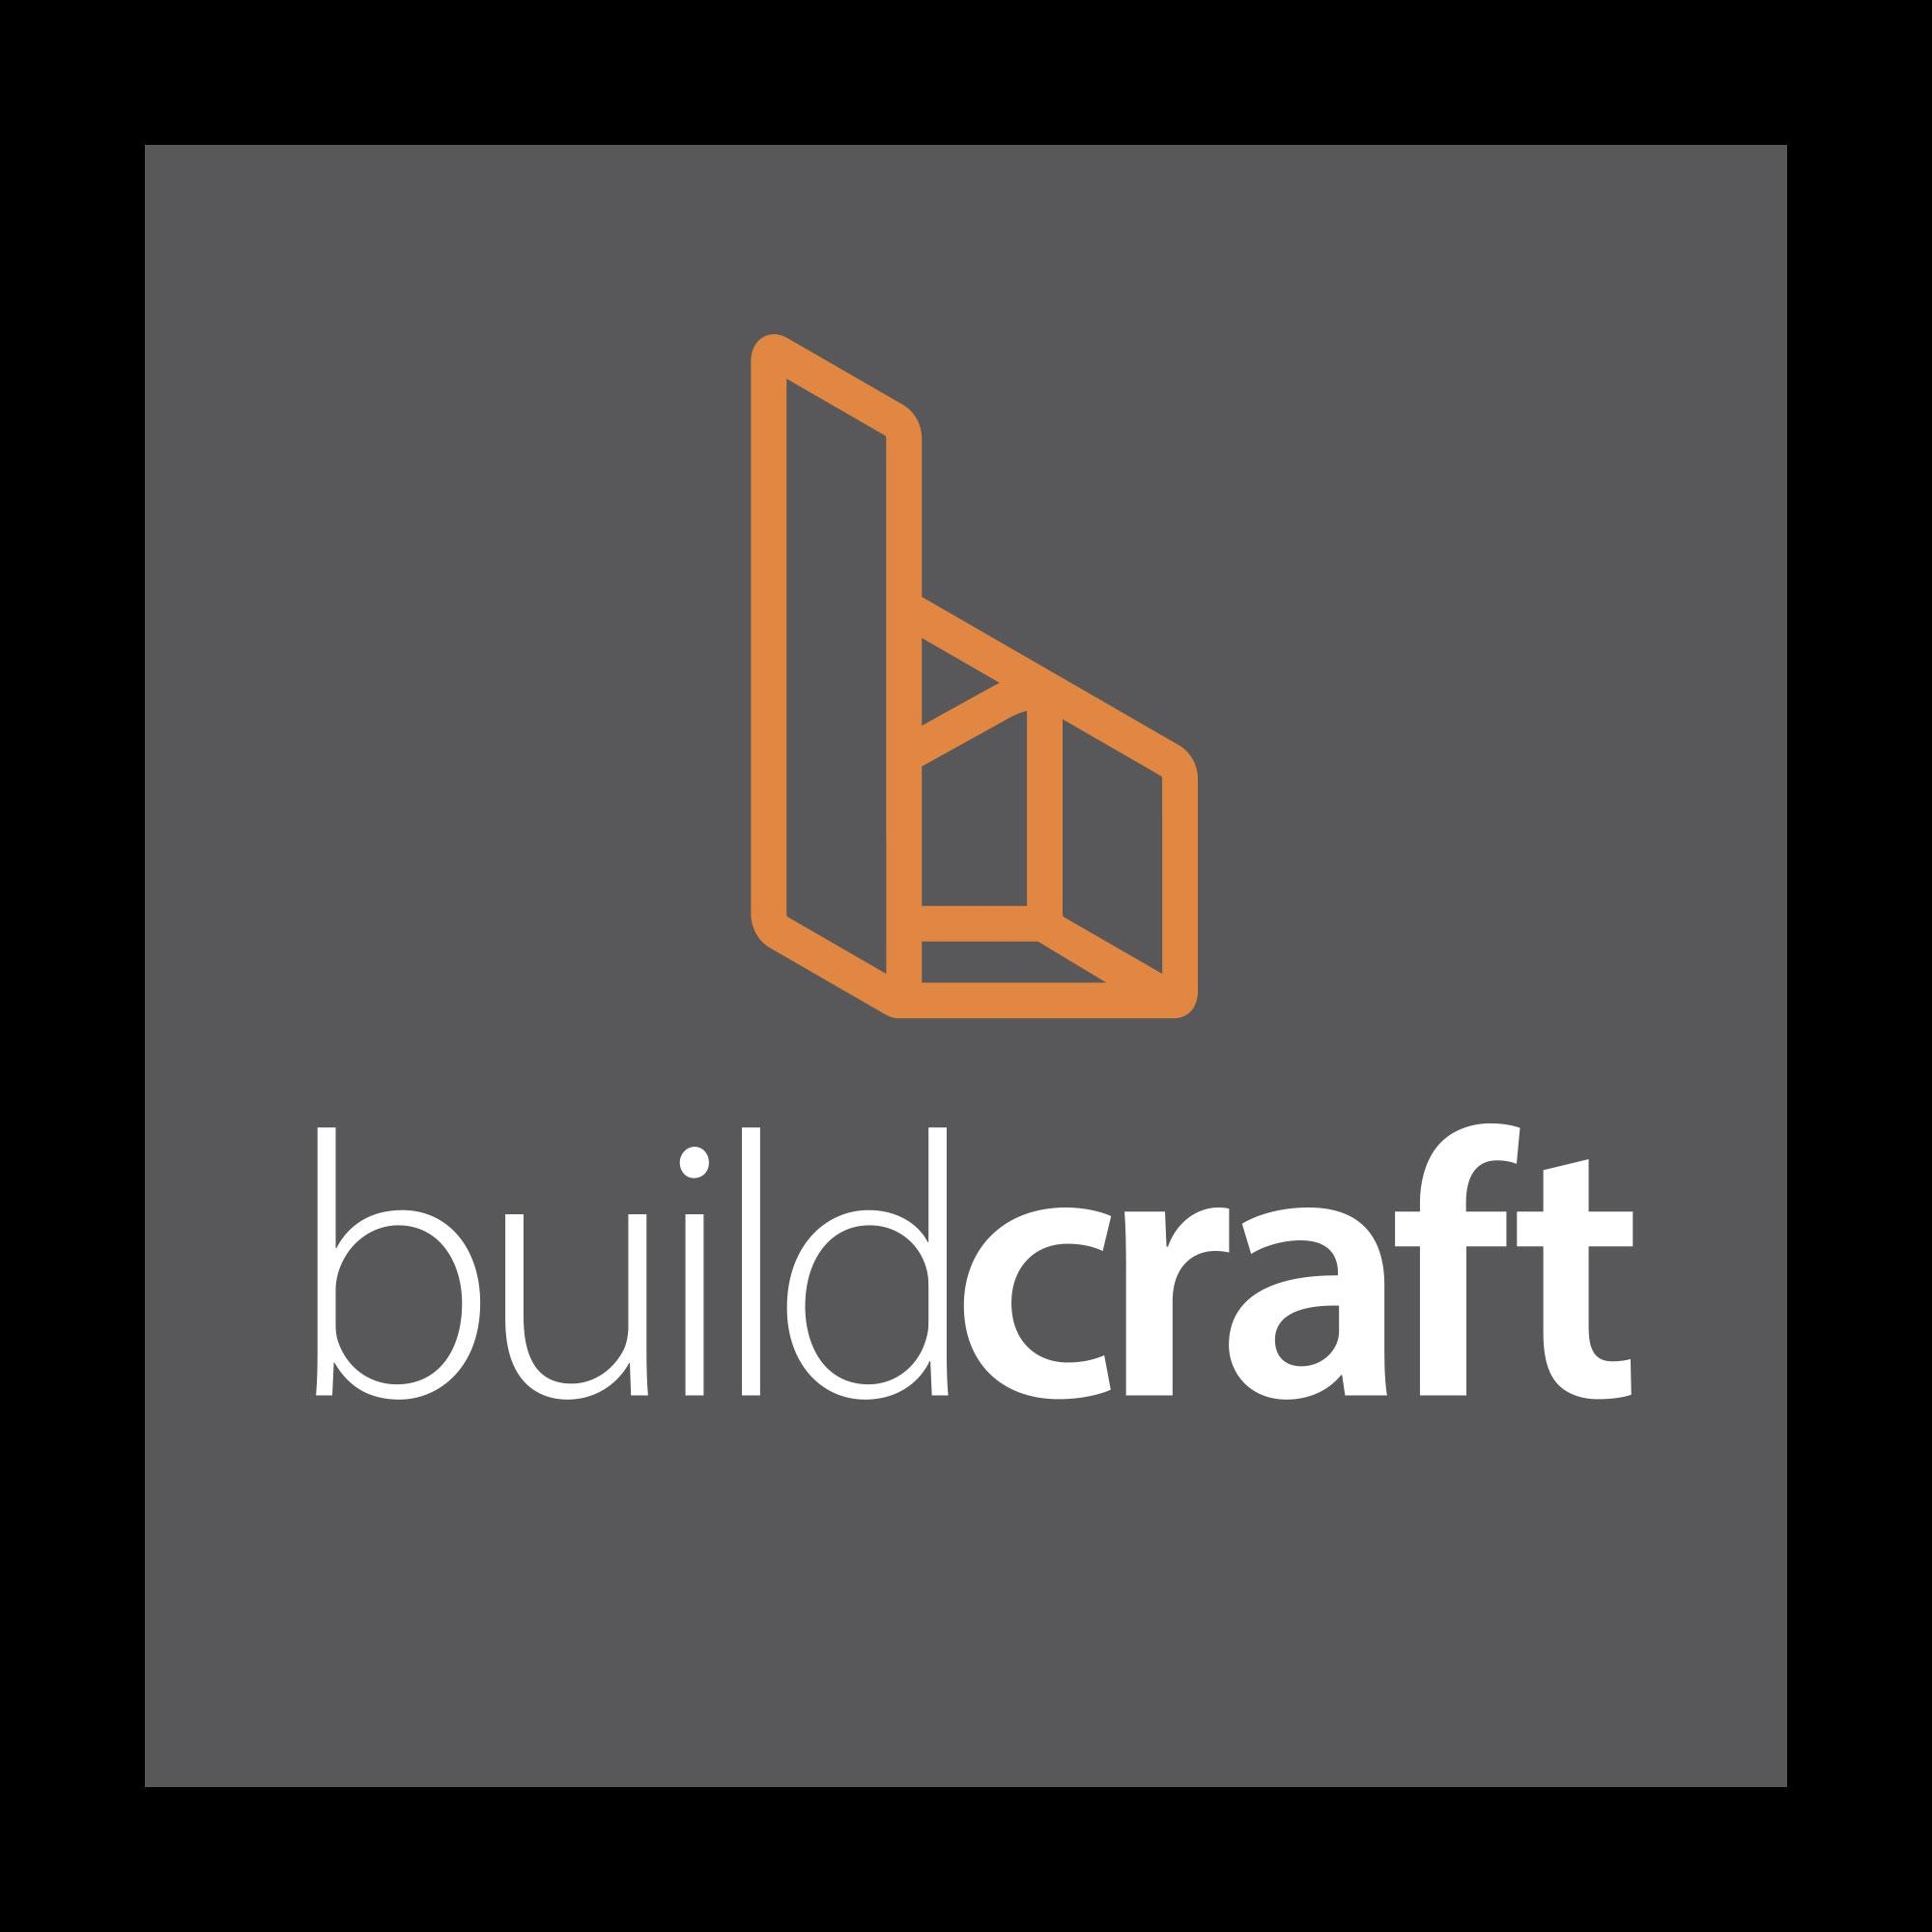 Builder naming and branding